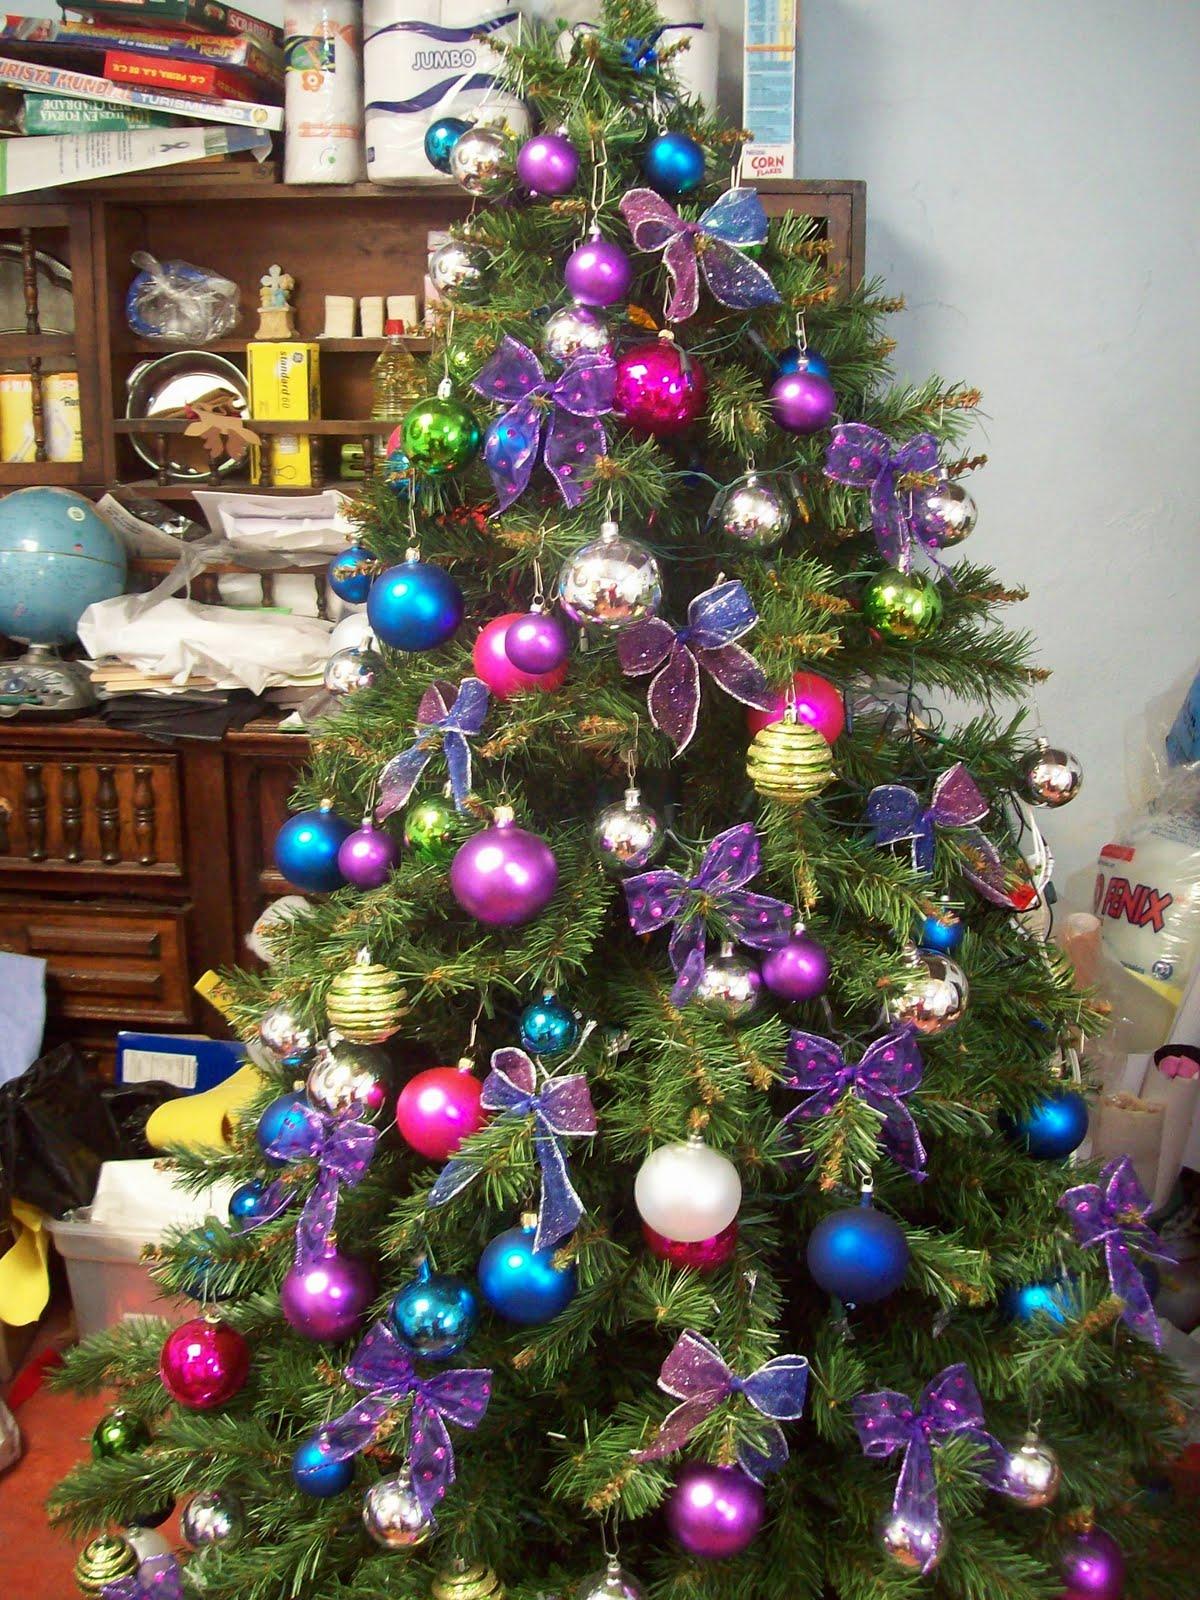 Shexeldetallitos blog de manualidades diciembre 2010 - Arbol navidad colores ...